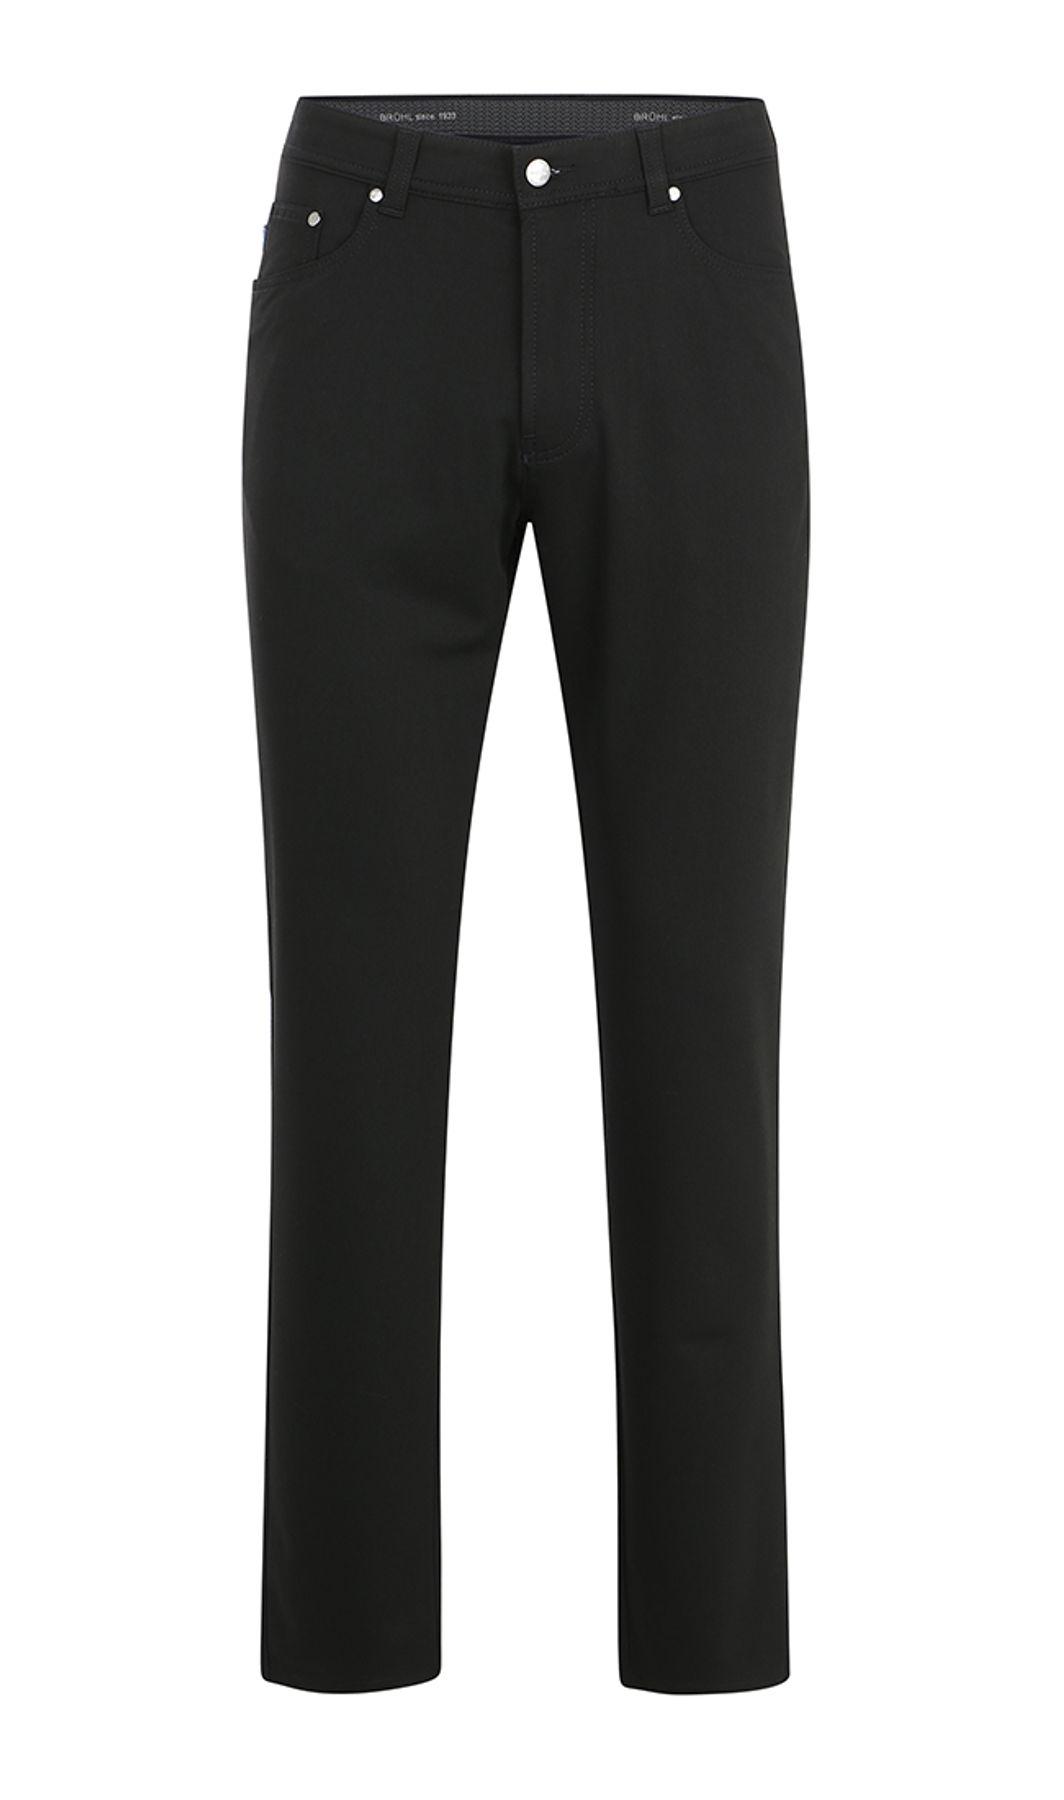 Brühl - Herren 5-Pocket Hose in Wolloptik in schwarz, Genua 1 (0289110200100) – Bild 1